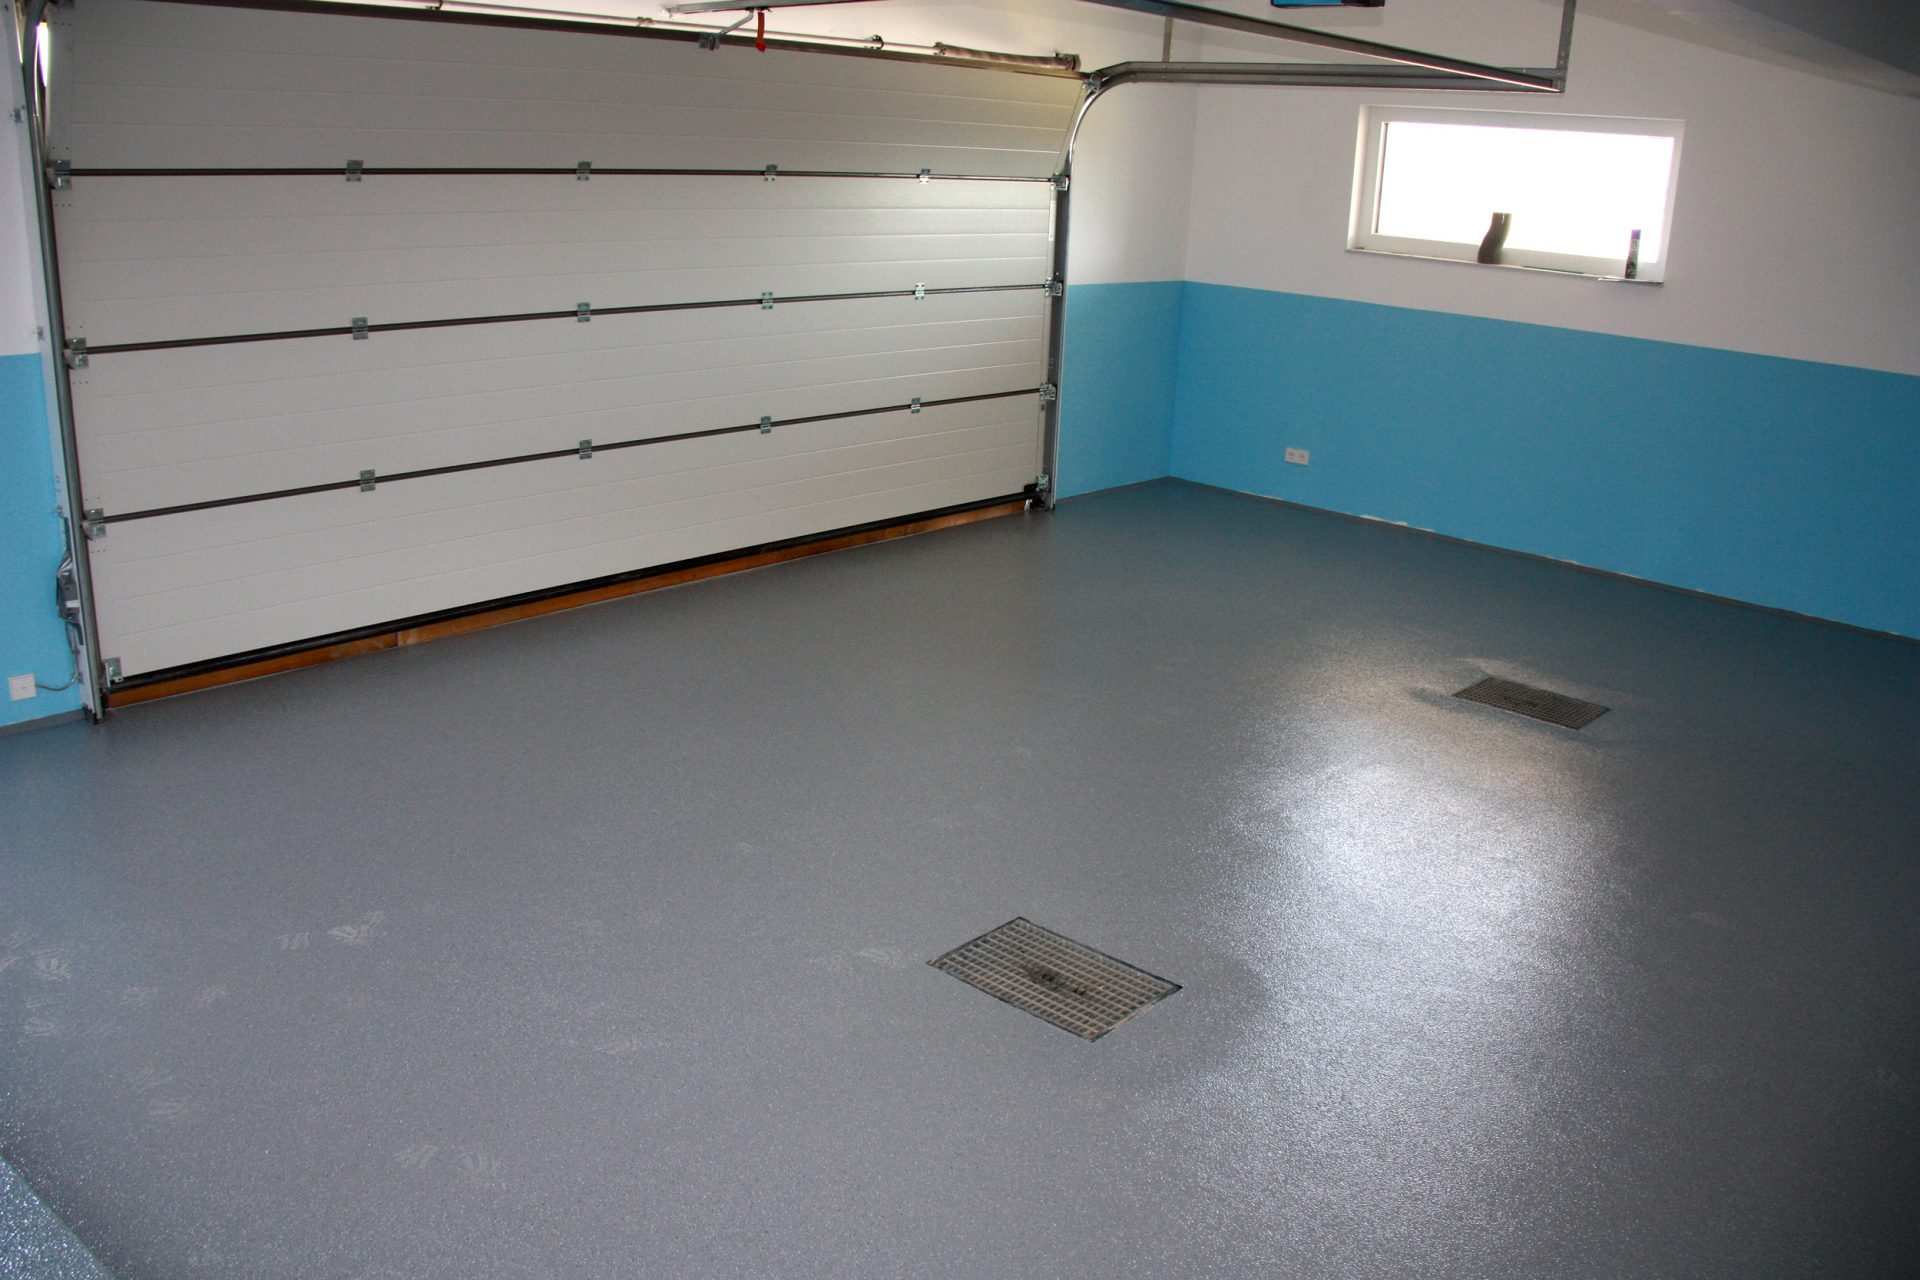 bodenbeschichtungen in garagen bautenschutz melcher. Black Bedroom Furniture Sets. Home Design Ideas